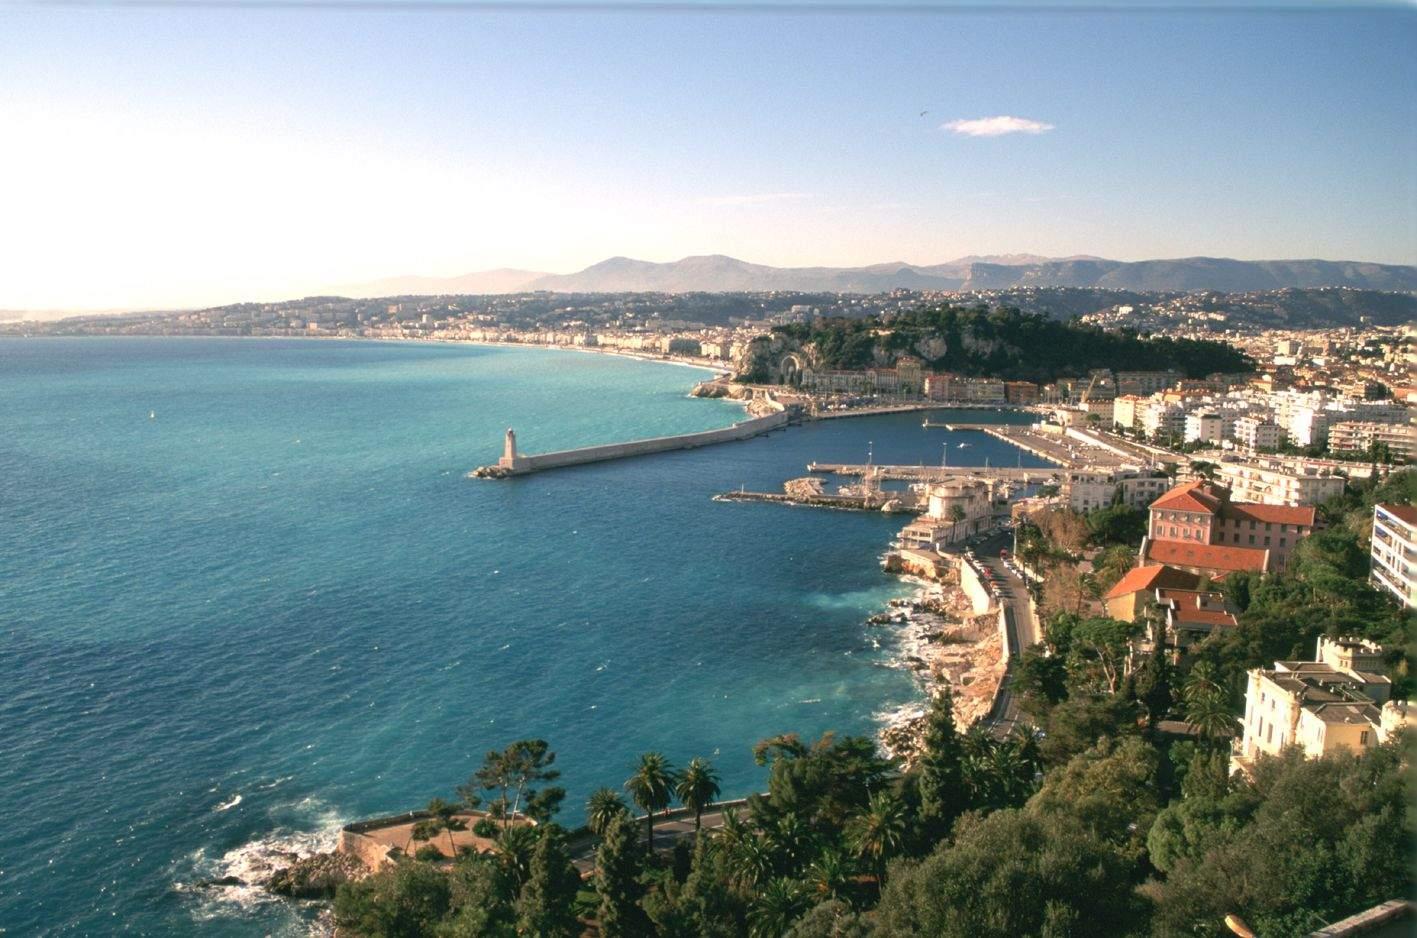 Best Western Nice · Hotel Alba 4 star · Nice Bay of Nice